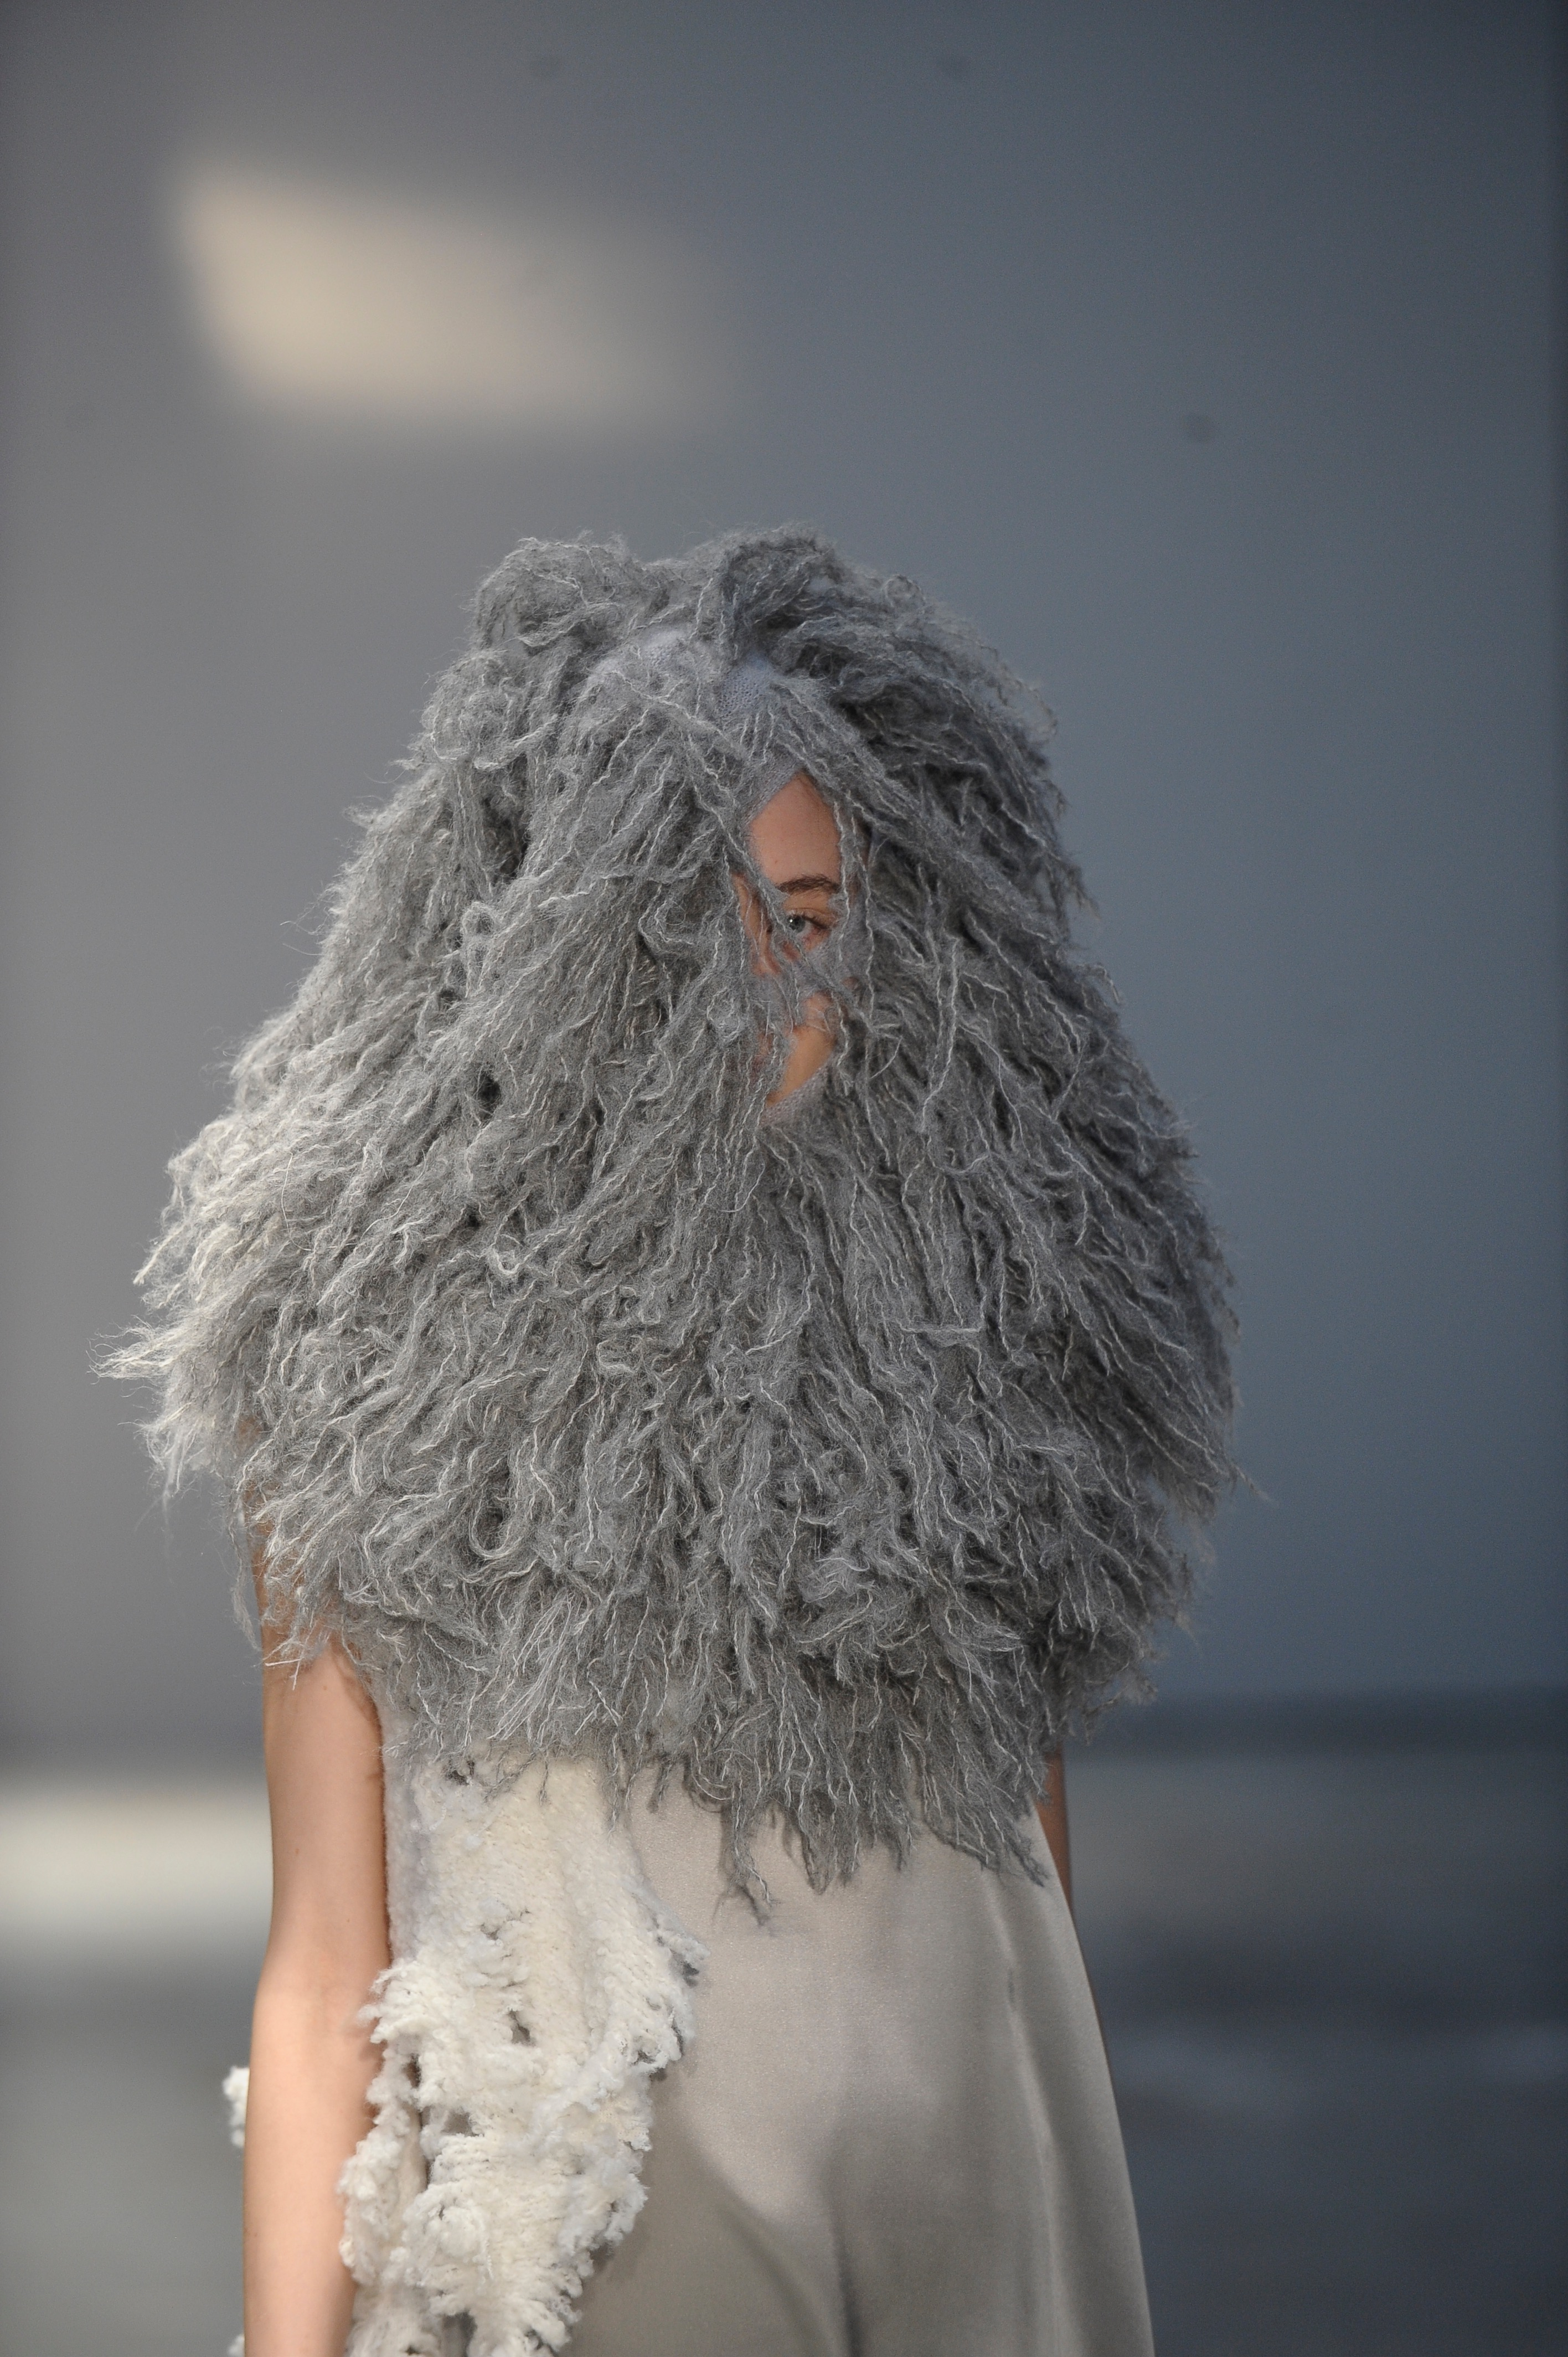 Olga Tytarenko, BA (Hons) Fashion Design Technology: Womenswear; Emily-Louise Coveney, BA (Hons) Fashion Textiles: Knit andNina De Marco, BA (Hons) Fashion Jewellery. Photographer: Roger Dean